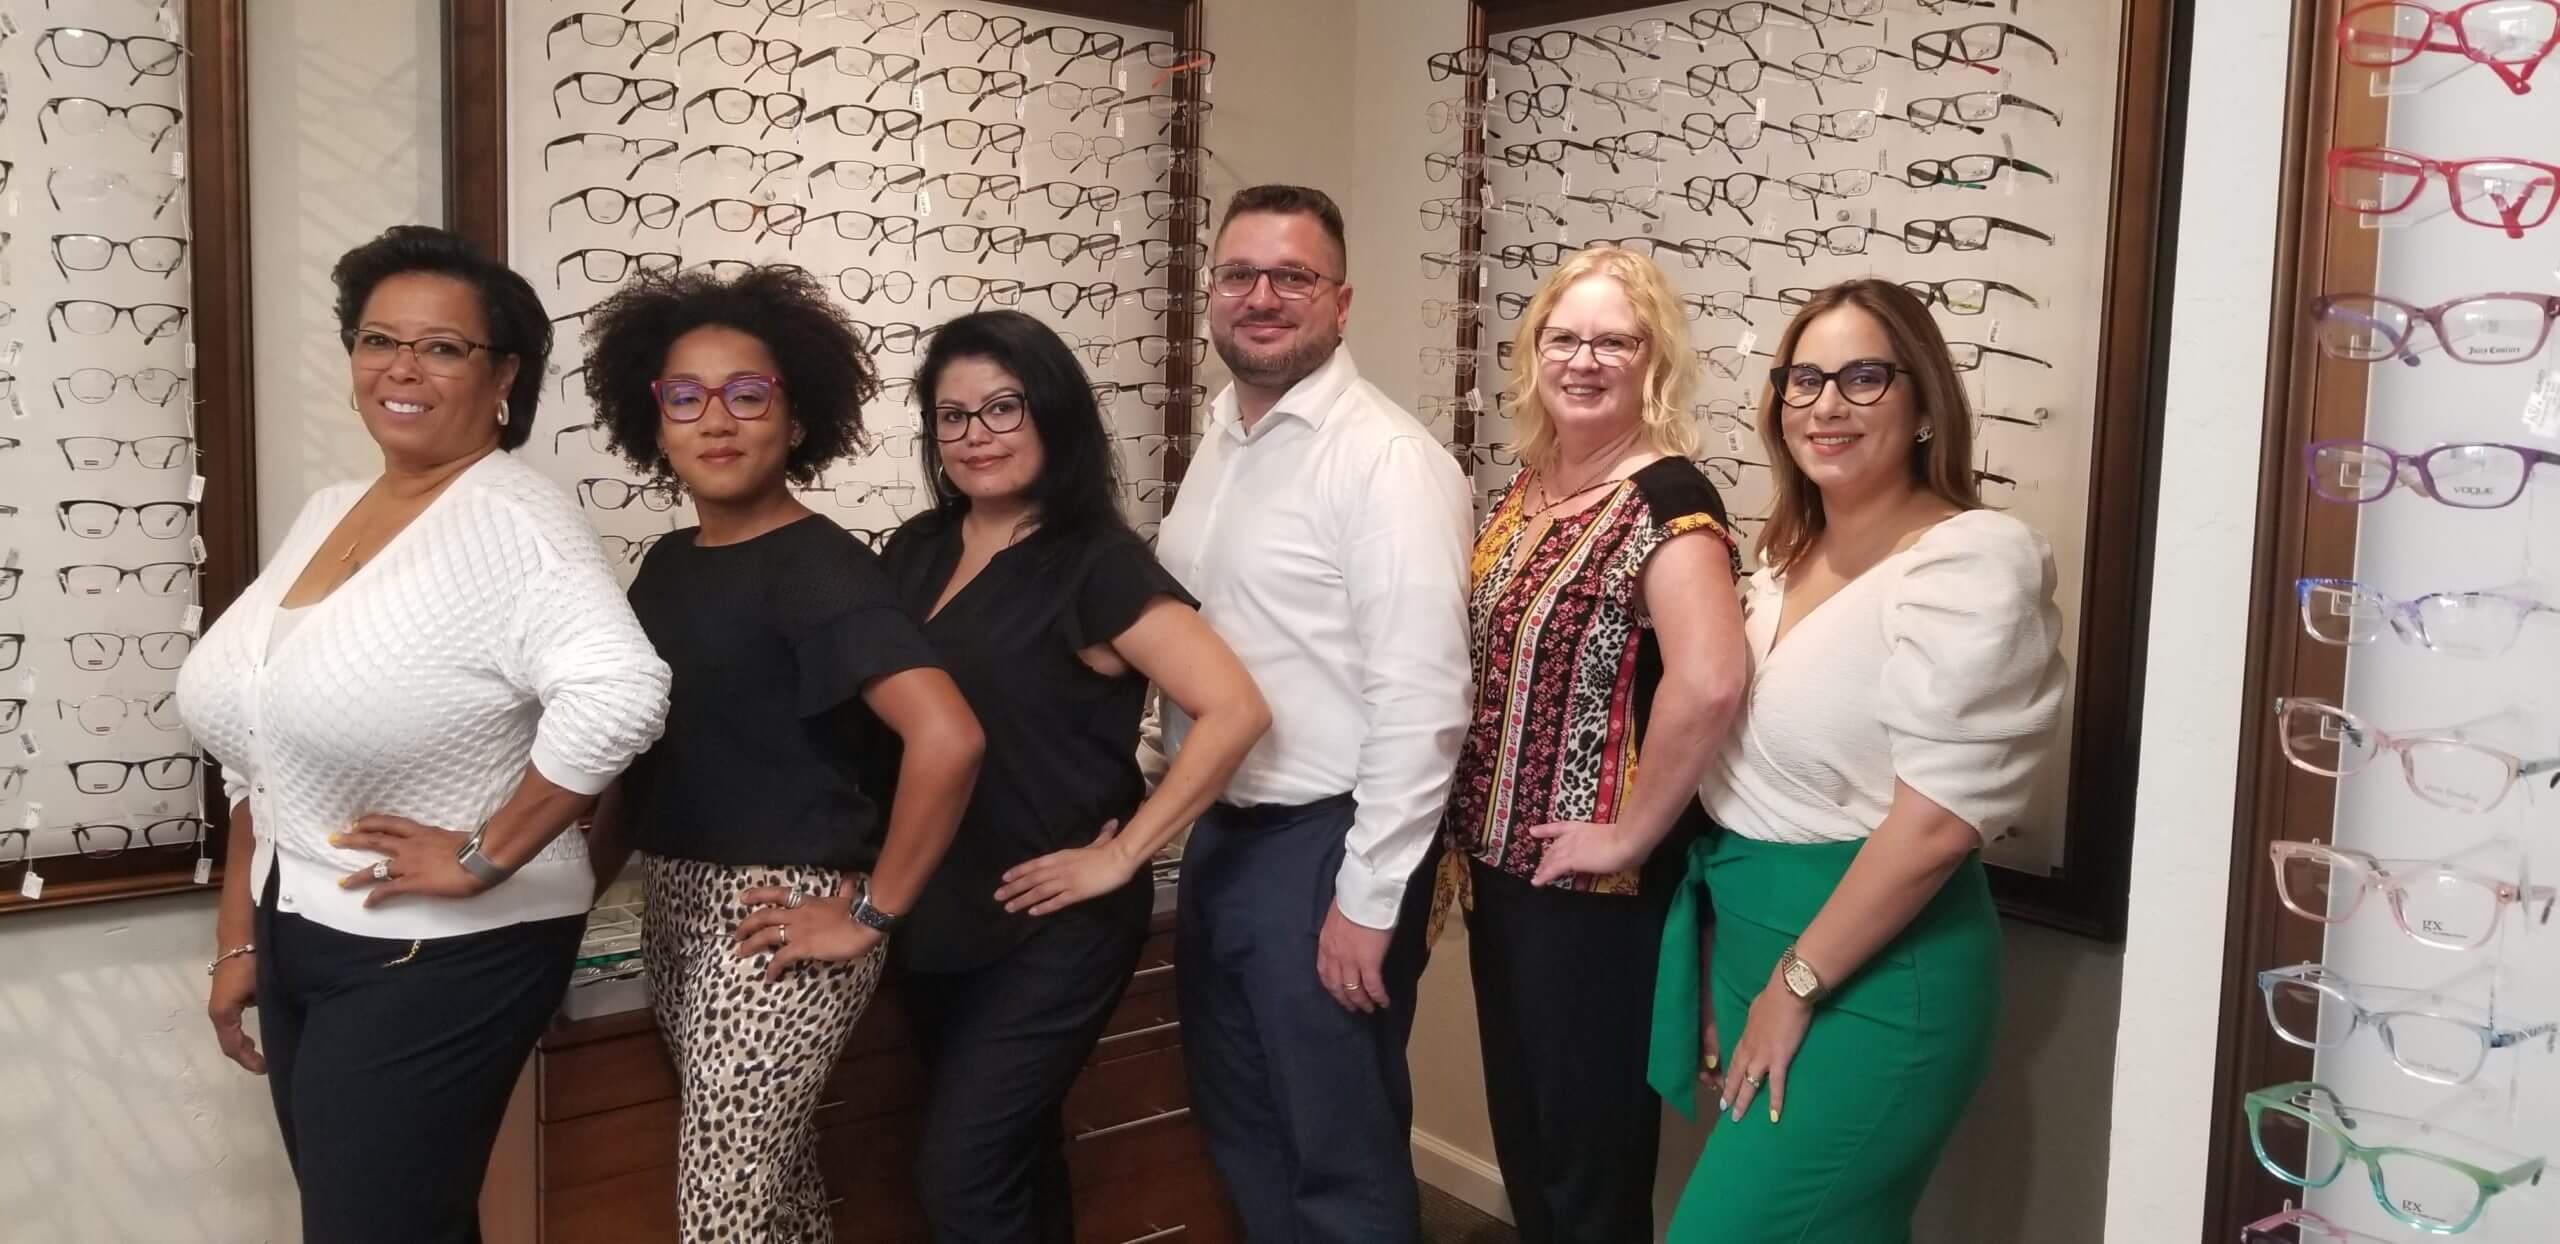 Our Optical Team in Lantana, Florida